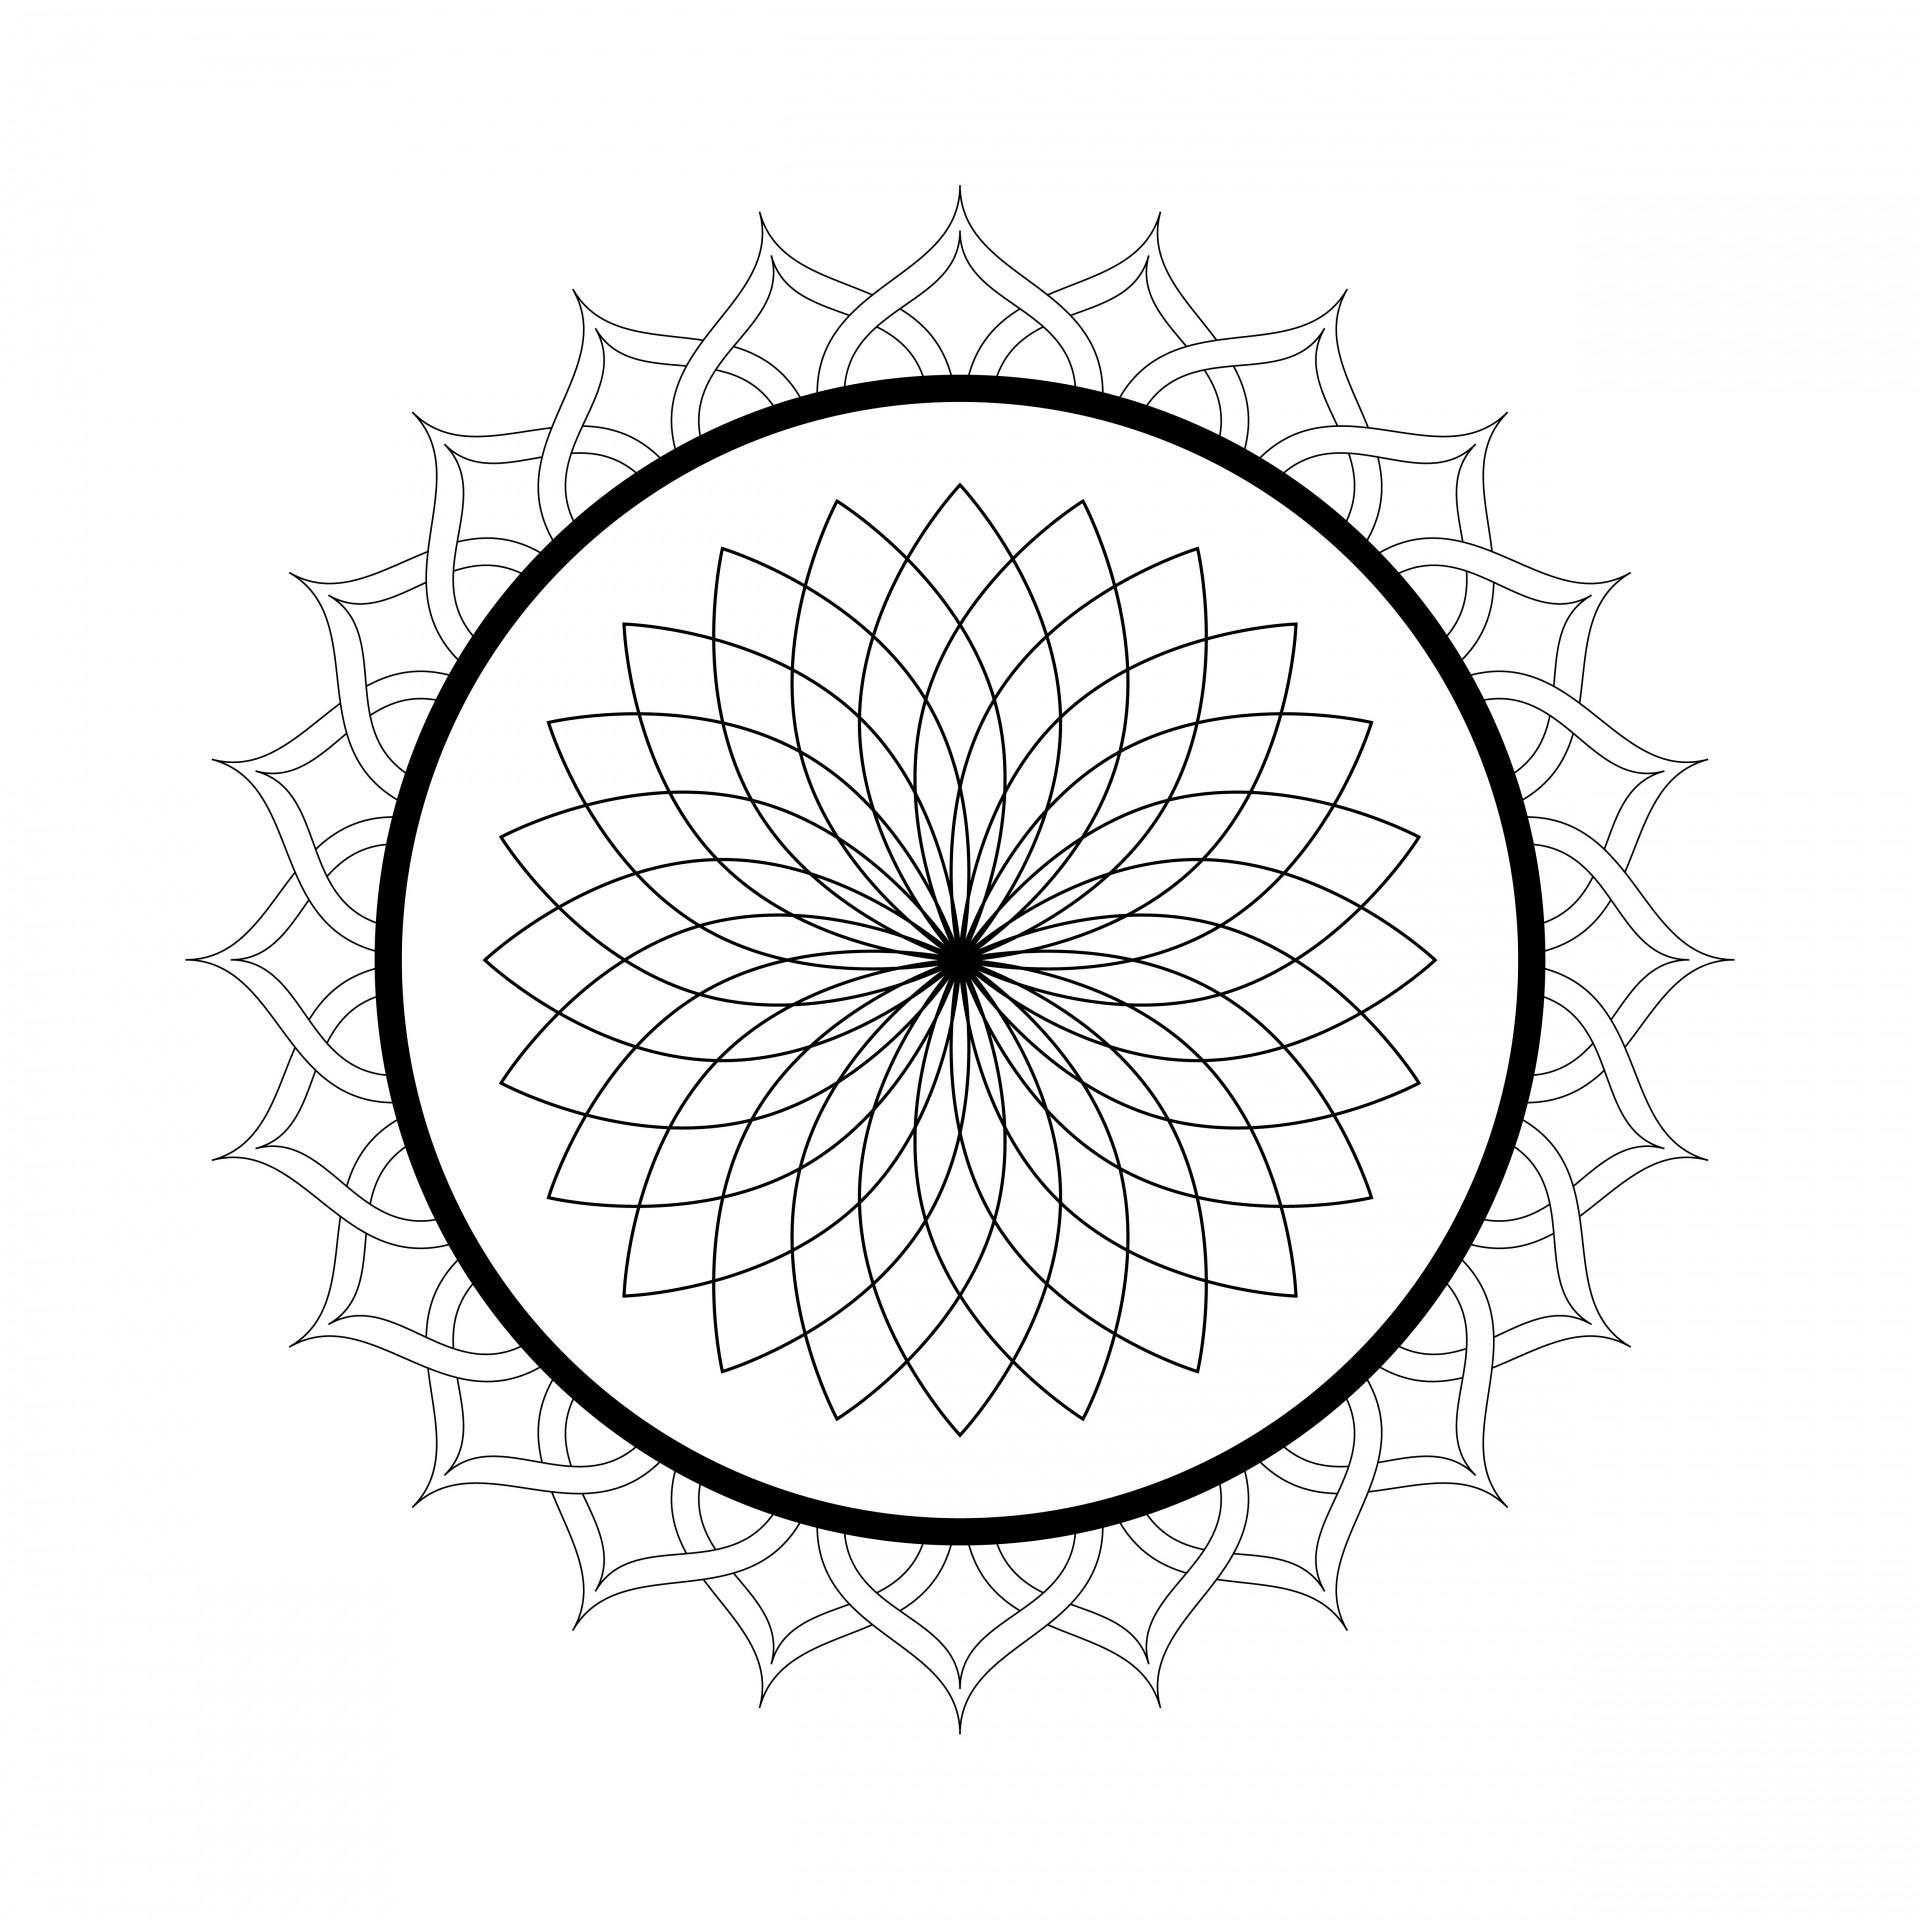 Kaleidoscope Mandala Coloring Page Free Stock Photo